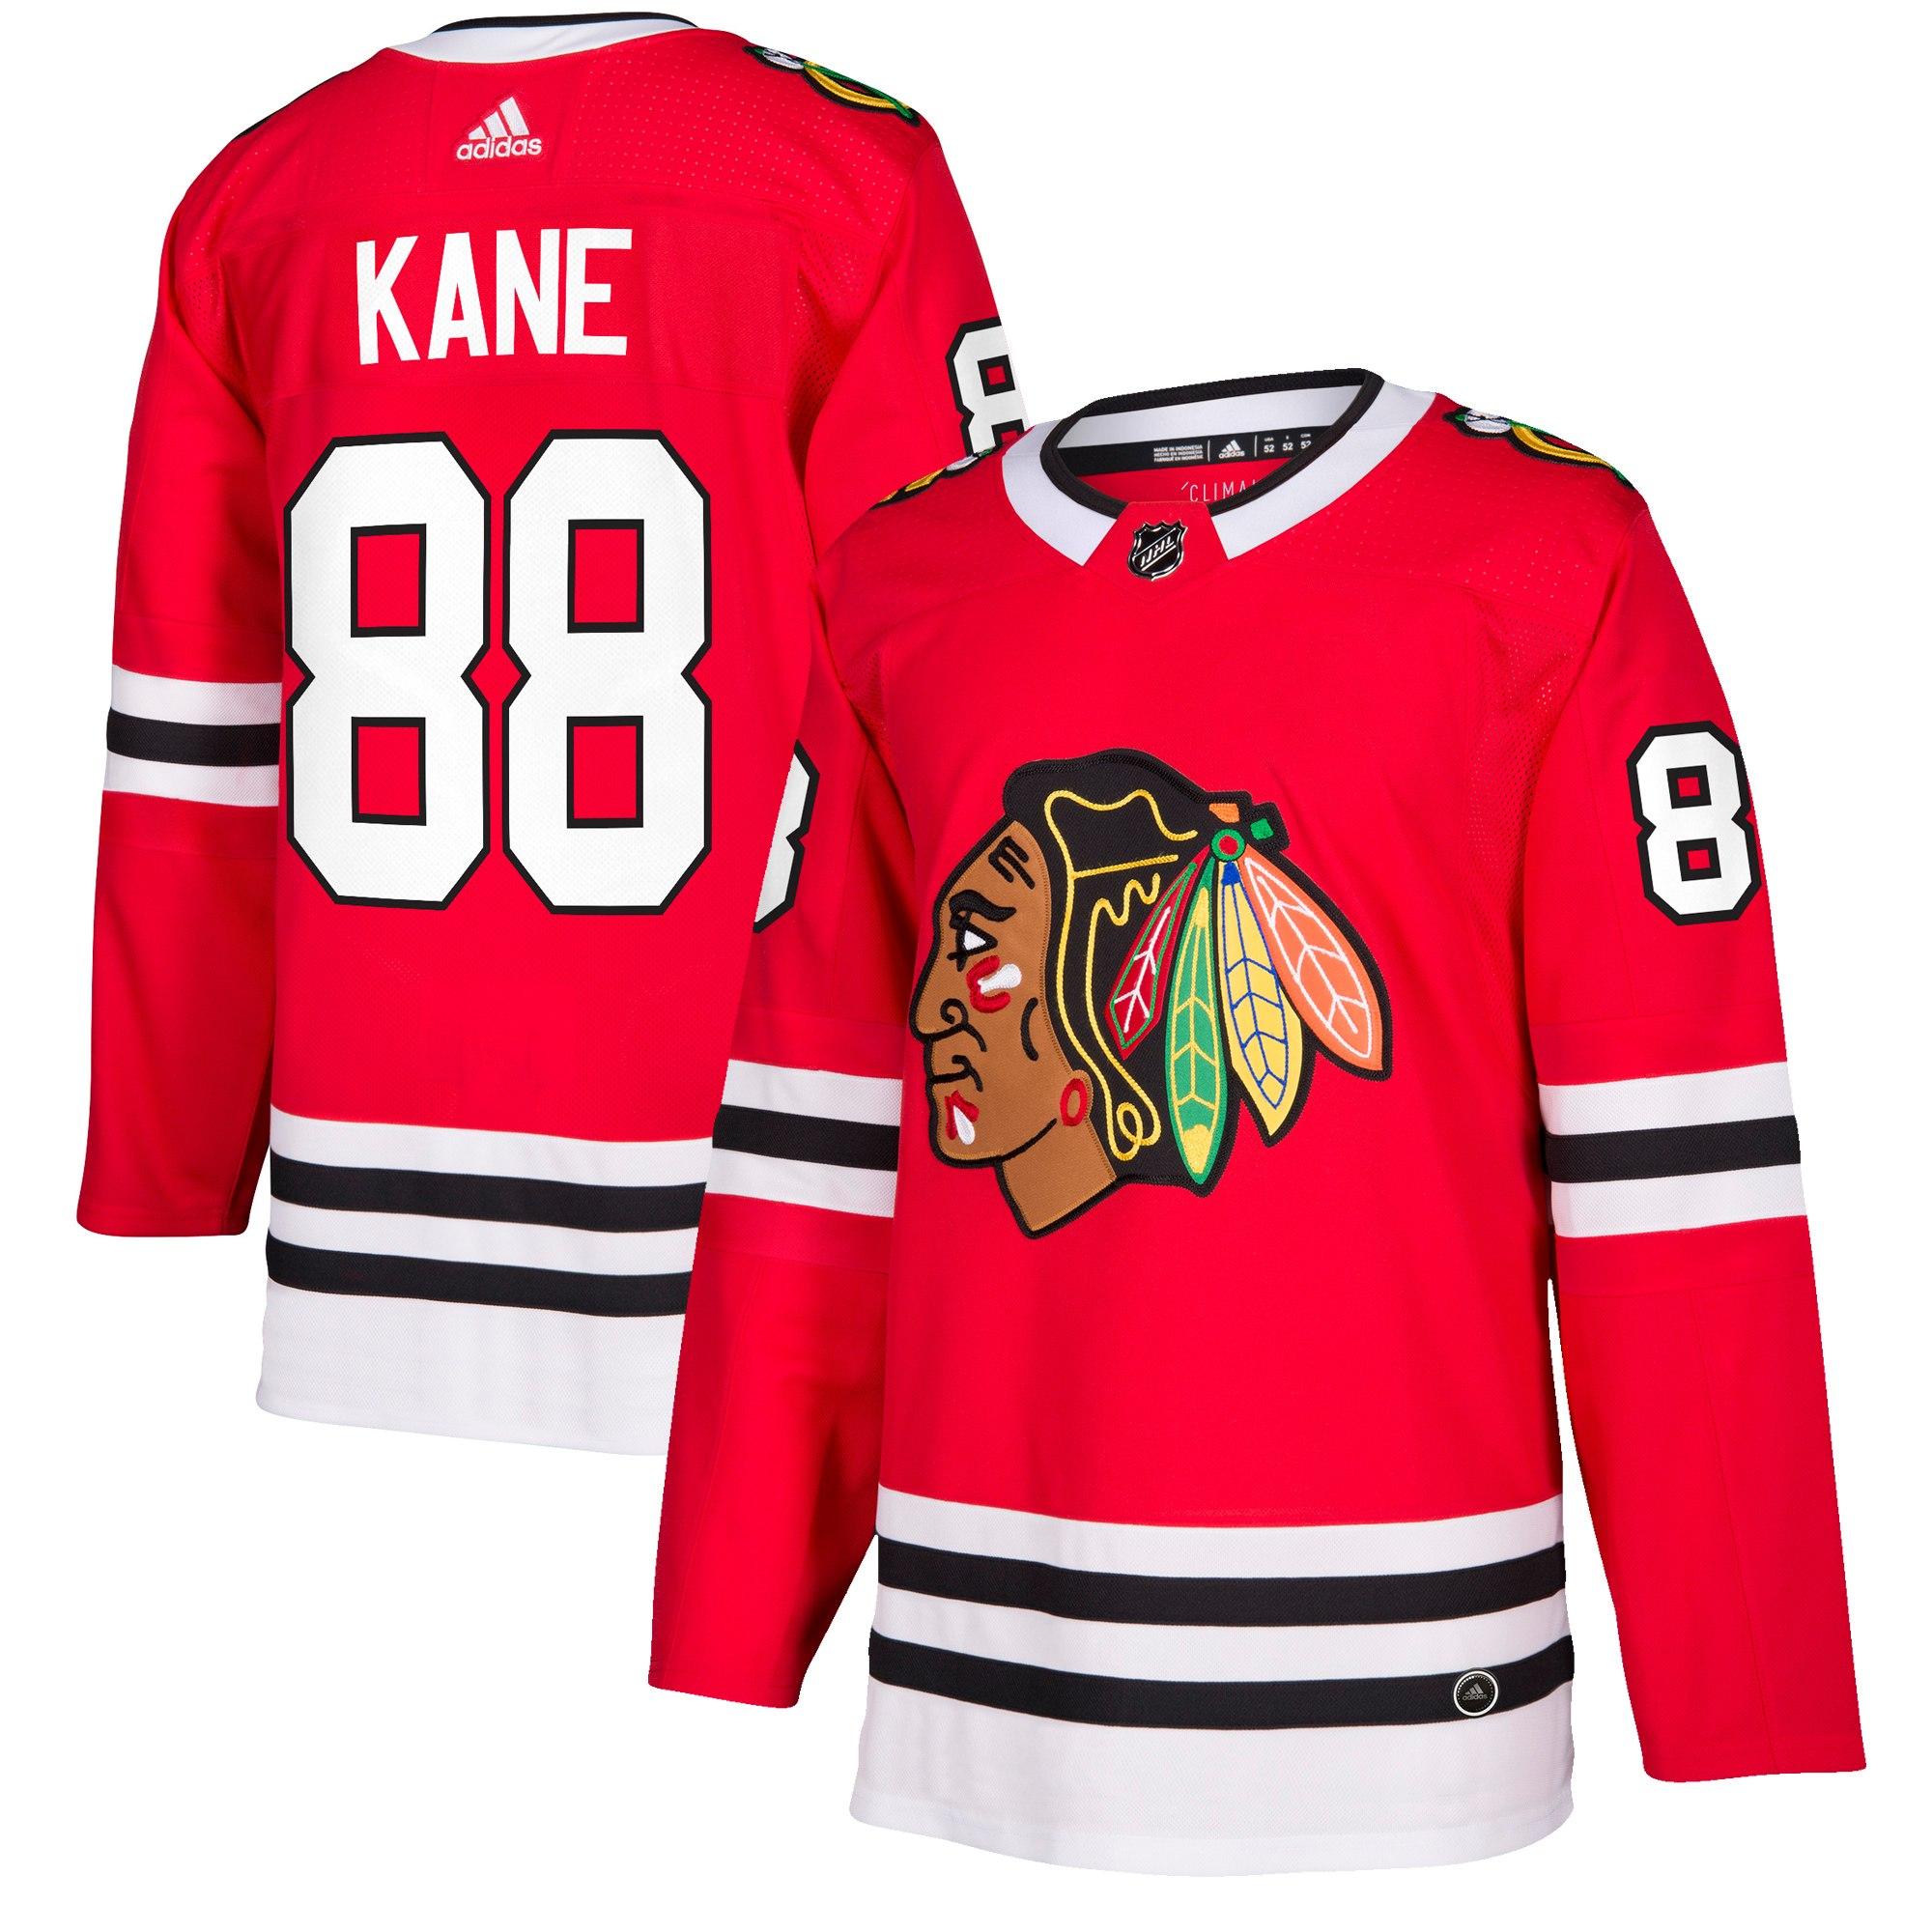 Adidas Dres Chicago Blackhawks #88 Patrick Kane adizero Home Authentic Player Pro Velikost: L, Distribuce: USA